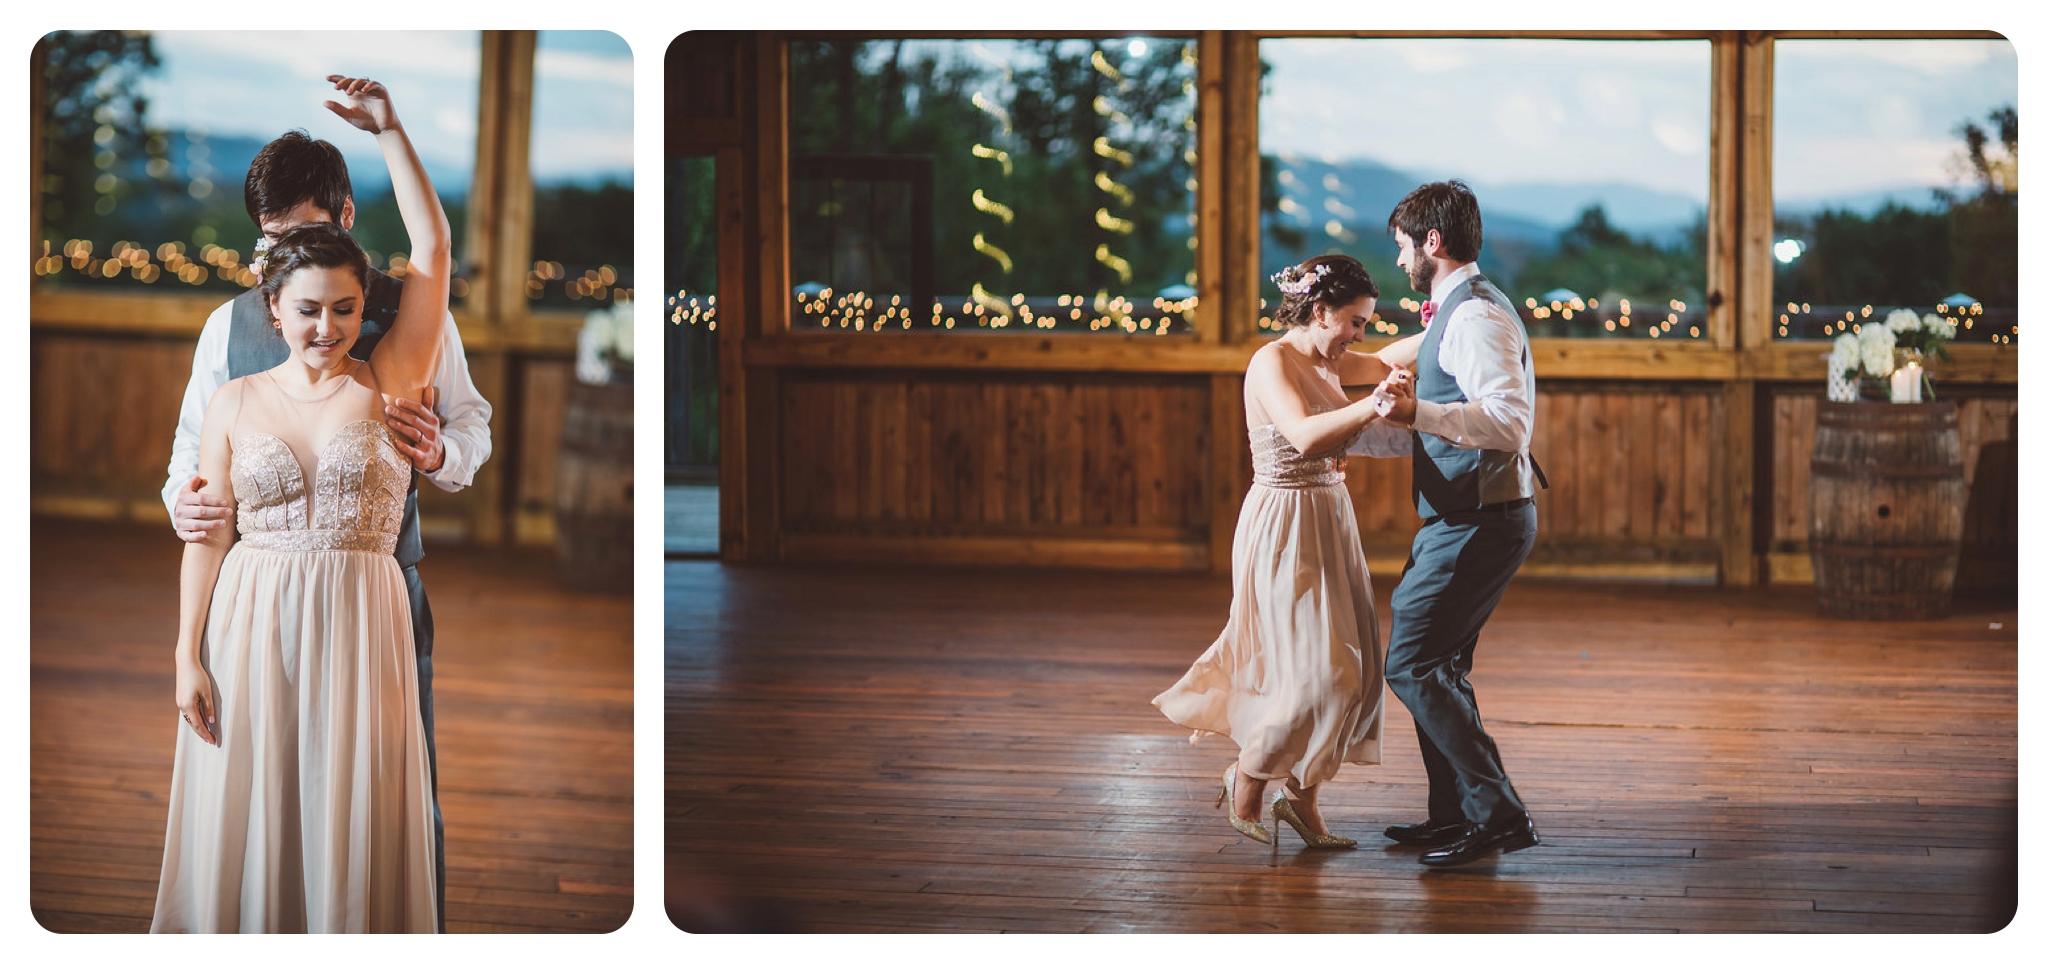 Braeloch-Weddings-Wedding-Photographer-Pat-Cori-Photography-039.jpg